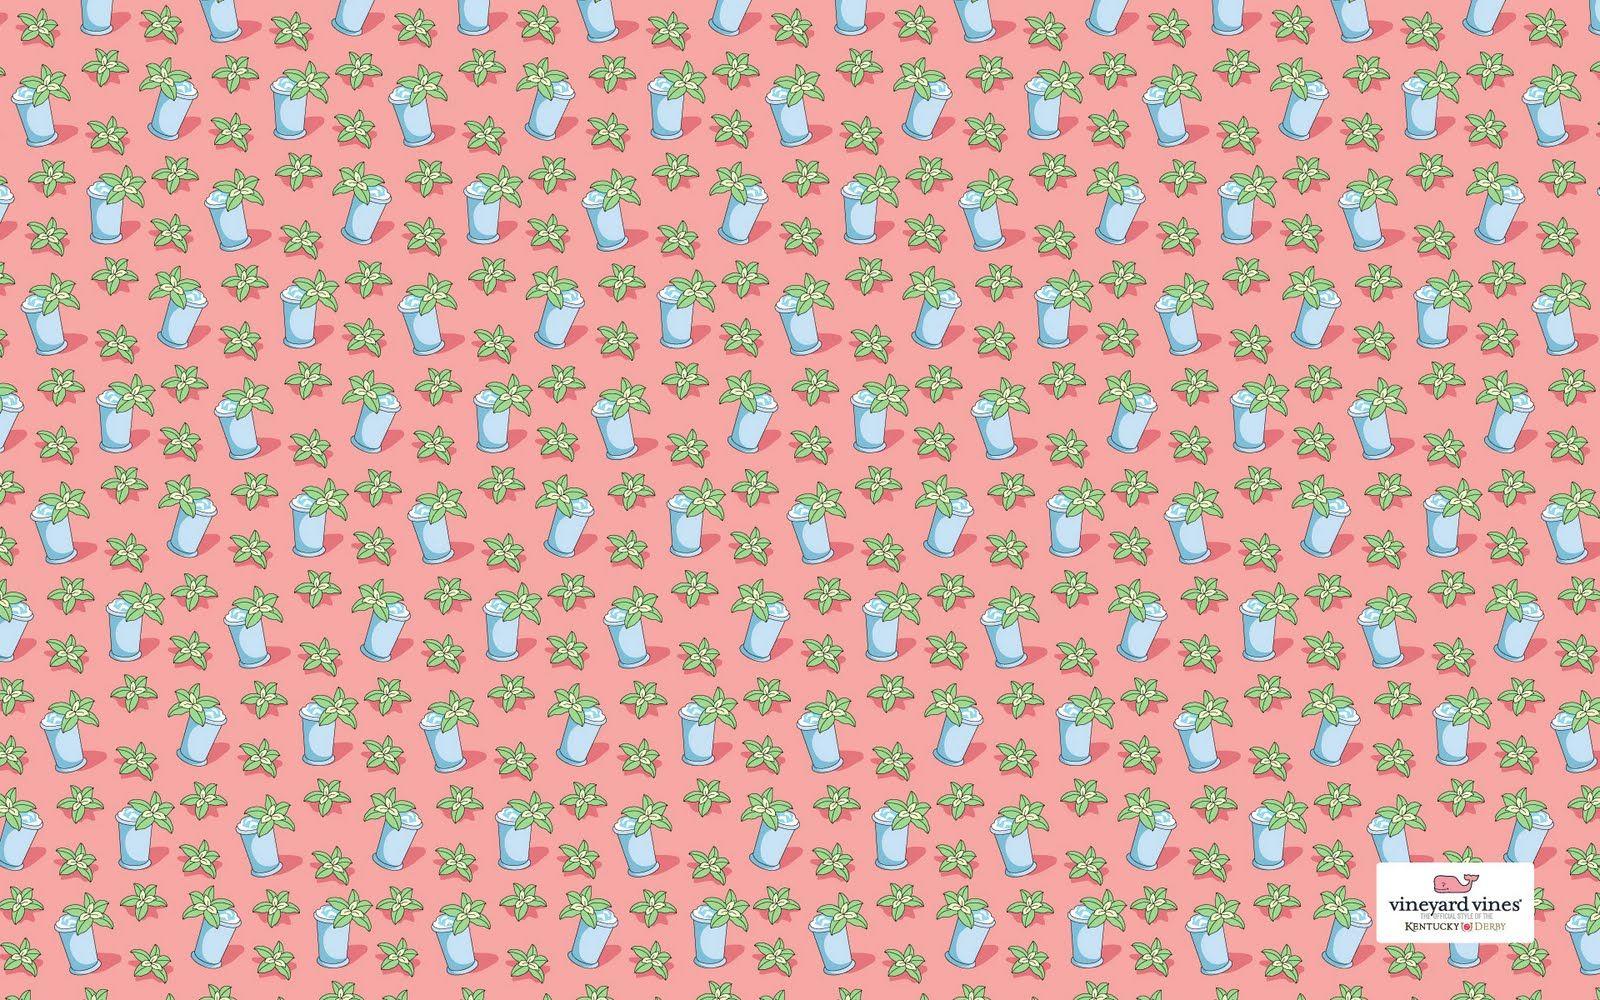 Vineyard Vines Whale Wallpaper   Picseriocom 1600x1000